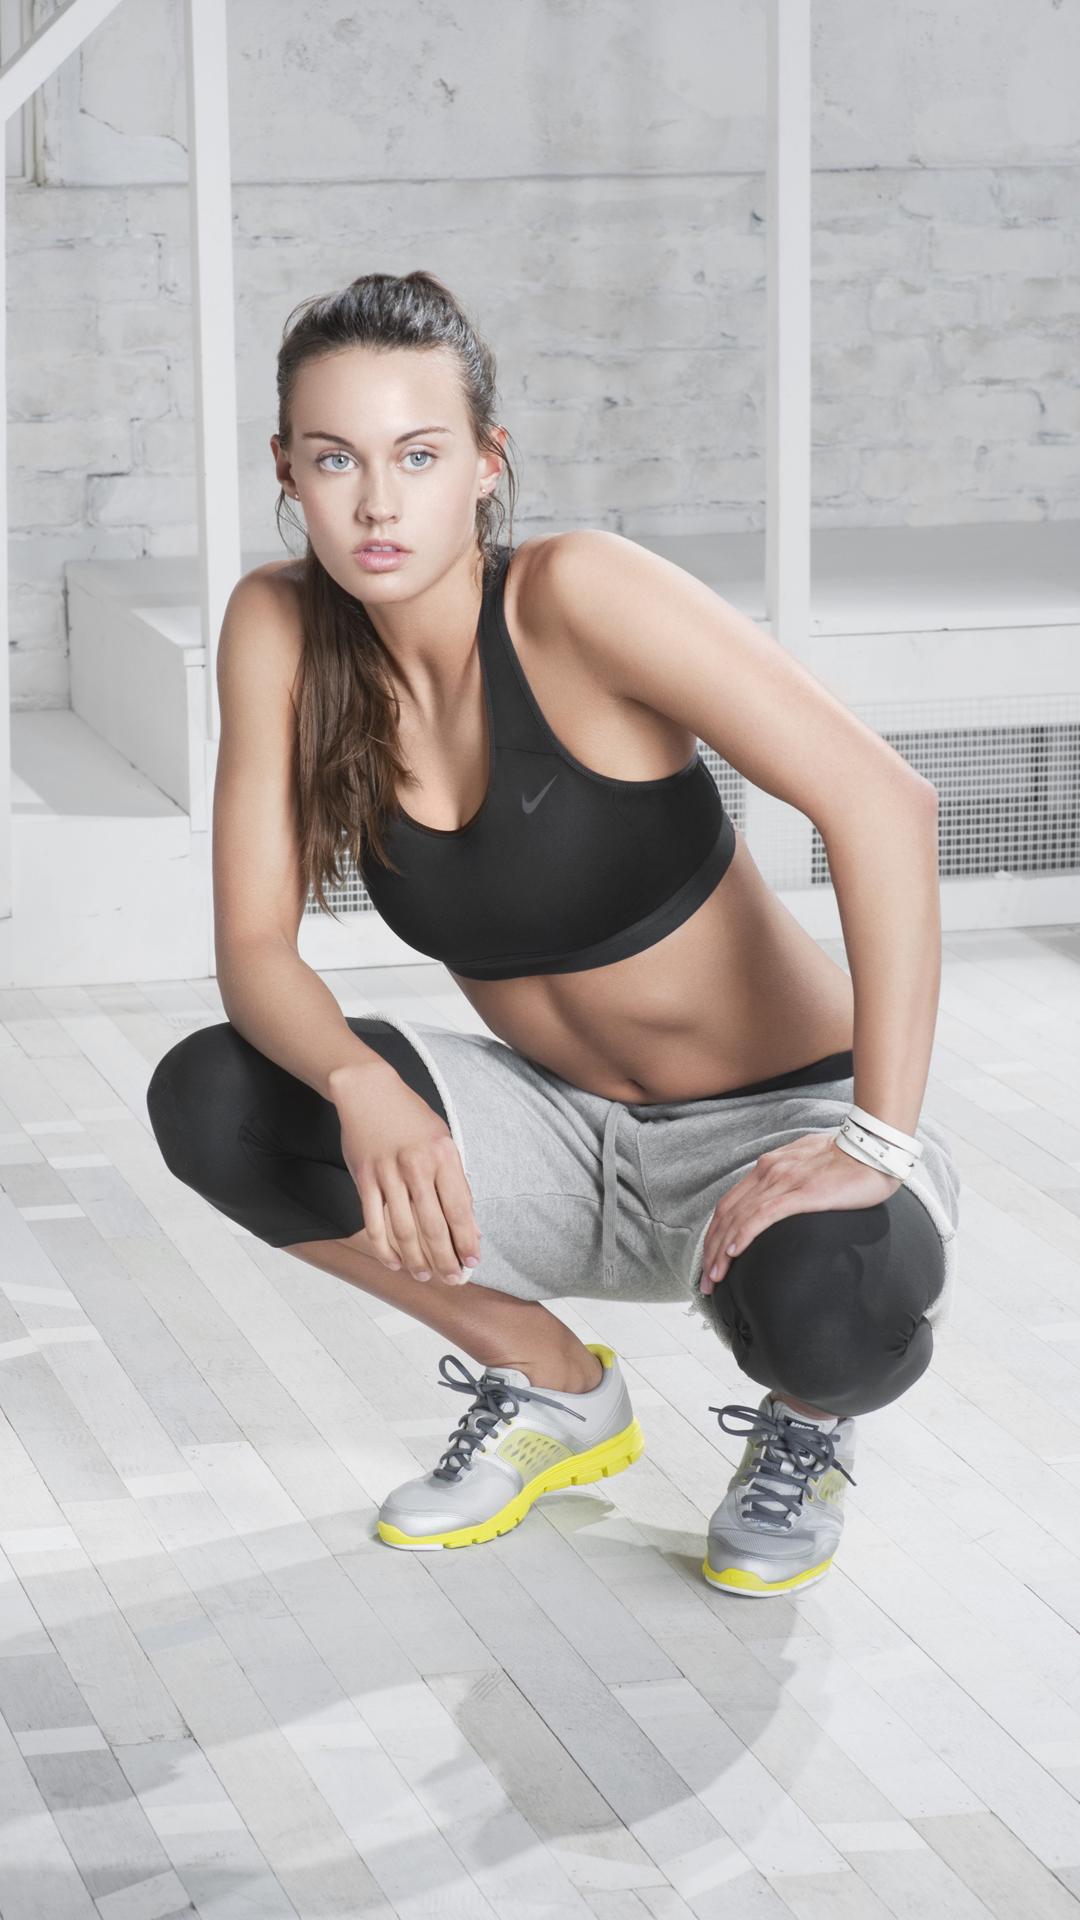 Nike Beautiful Girl Nike Girl Wallpaper Hd 2087345 Hd